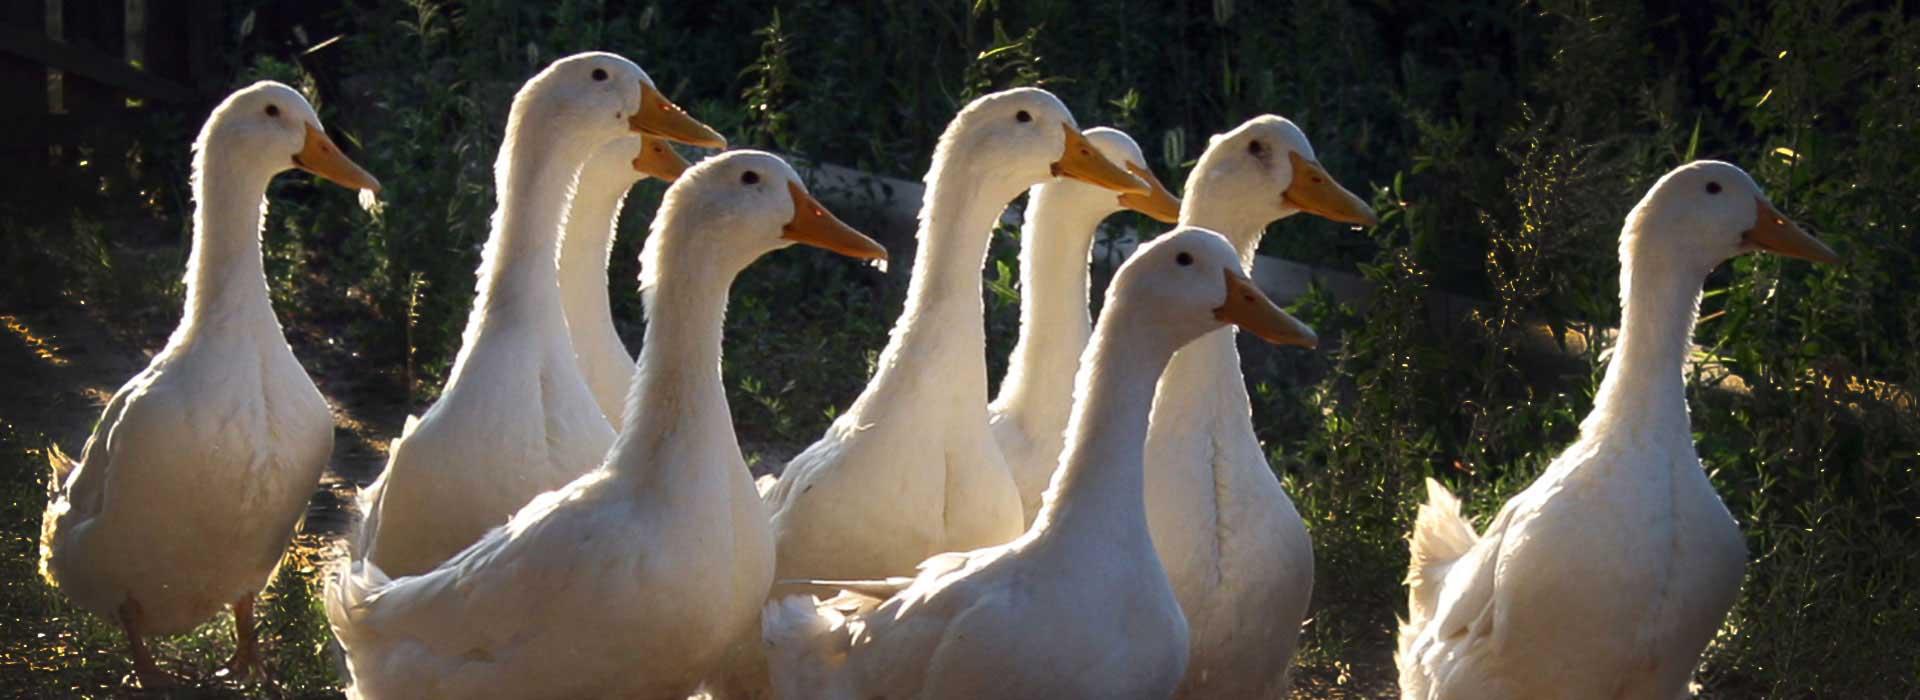 Развитие производства мяса с/х птицы